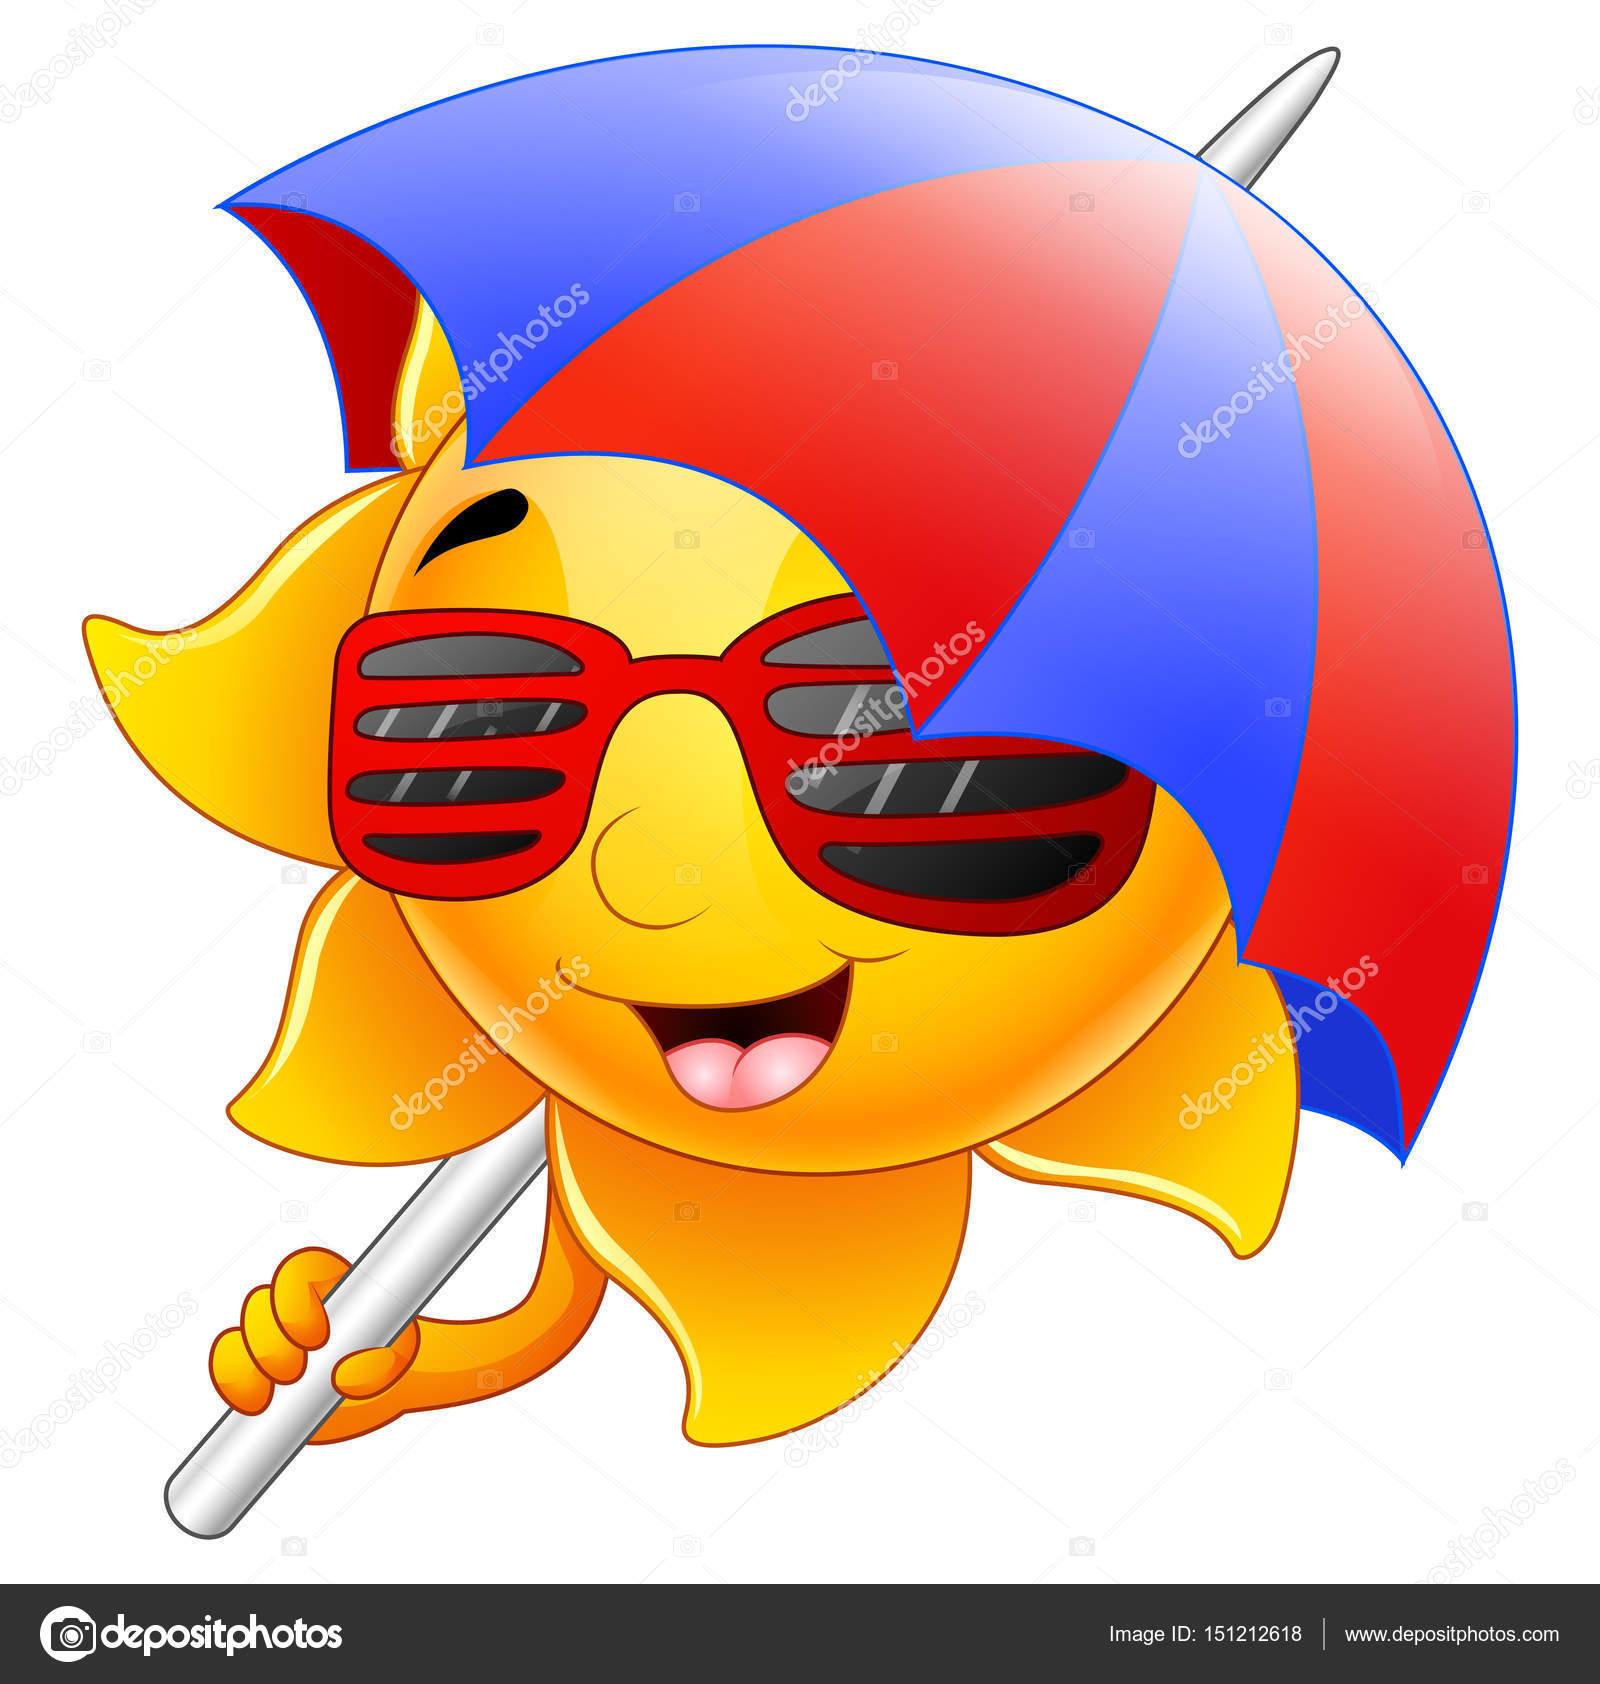 bab3b0216d78ae Zon teken cartoon met zonnebril en paraplu — Stockvector © dualoro ...